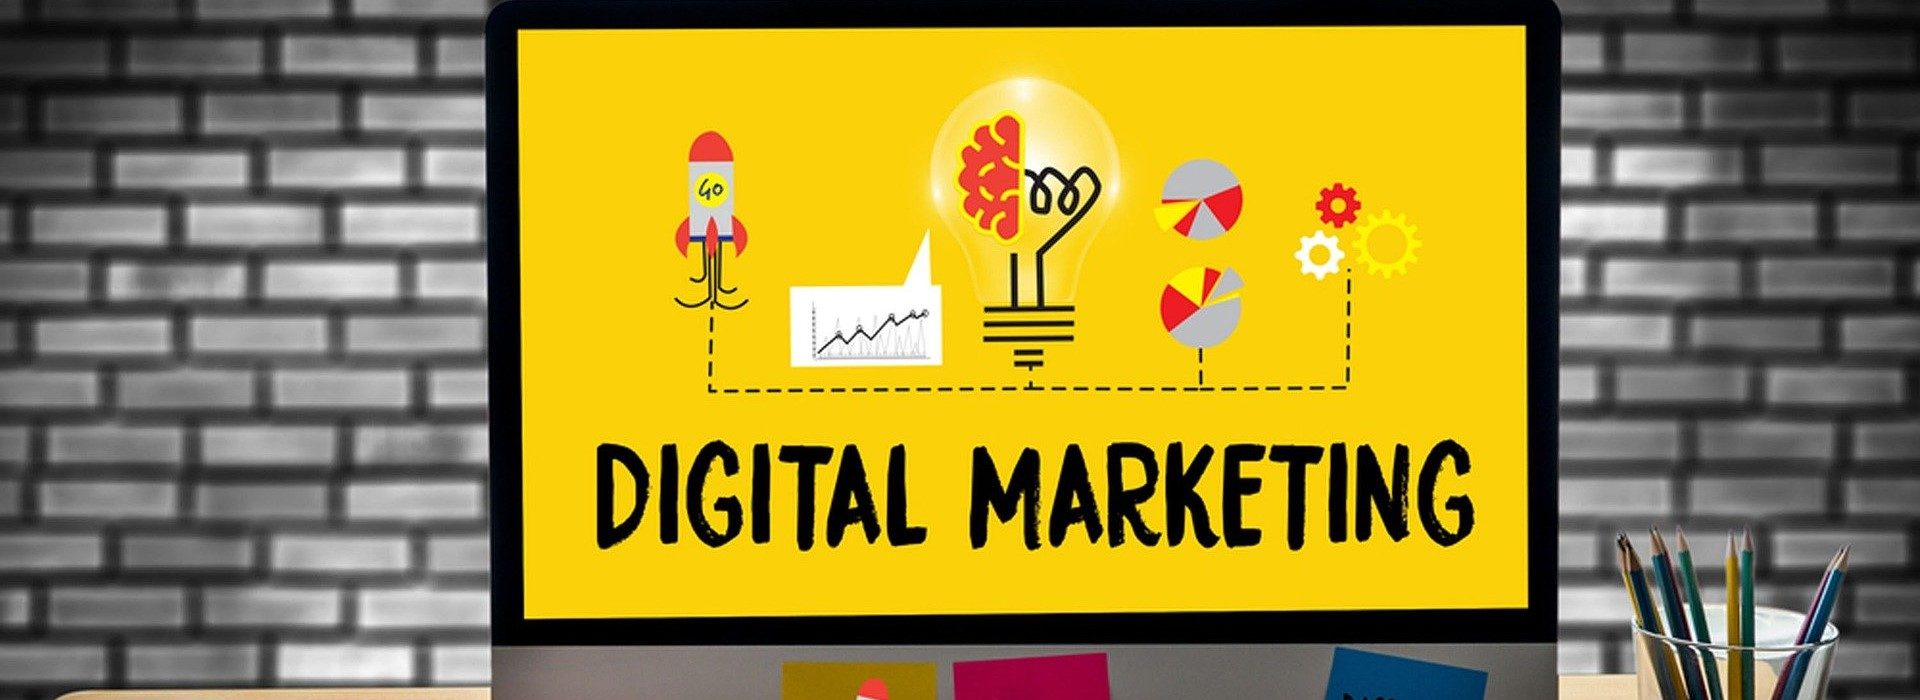 Digital Marketing einfach wie nie